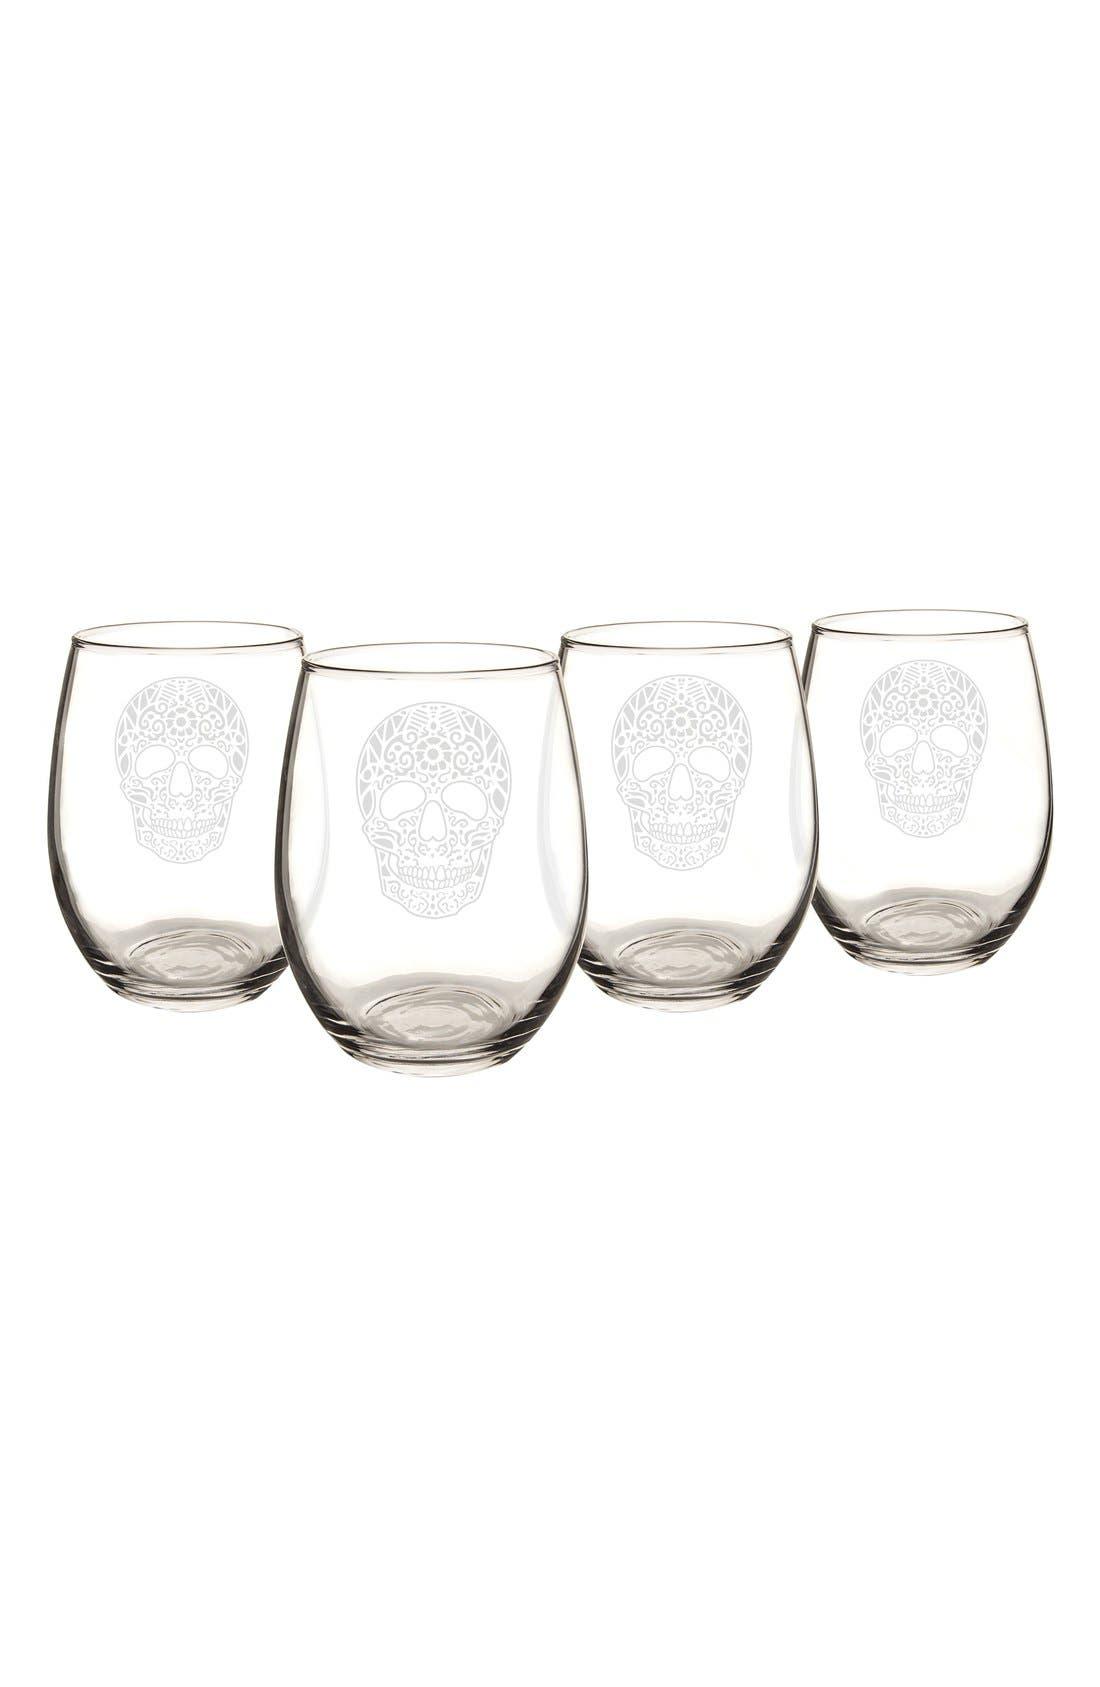 Sugar Skulls Set of 4 Stemless Wine Glasses,                         Main,                         color, Clear